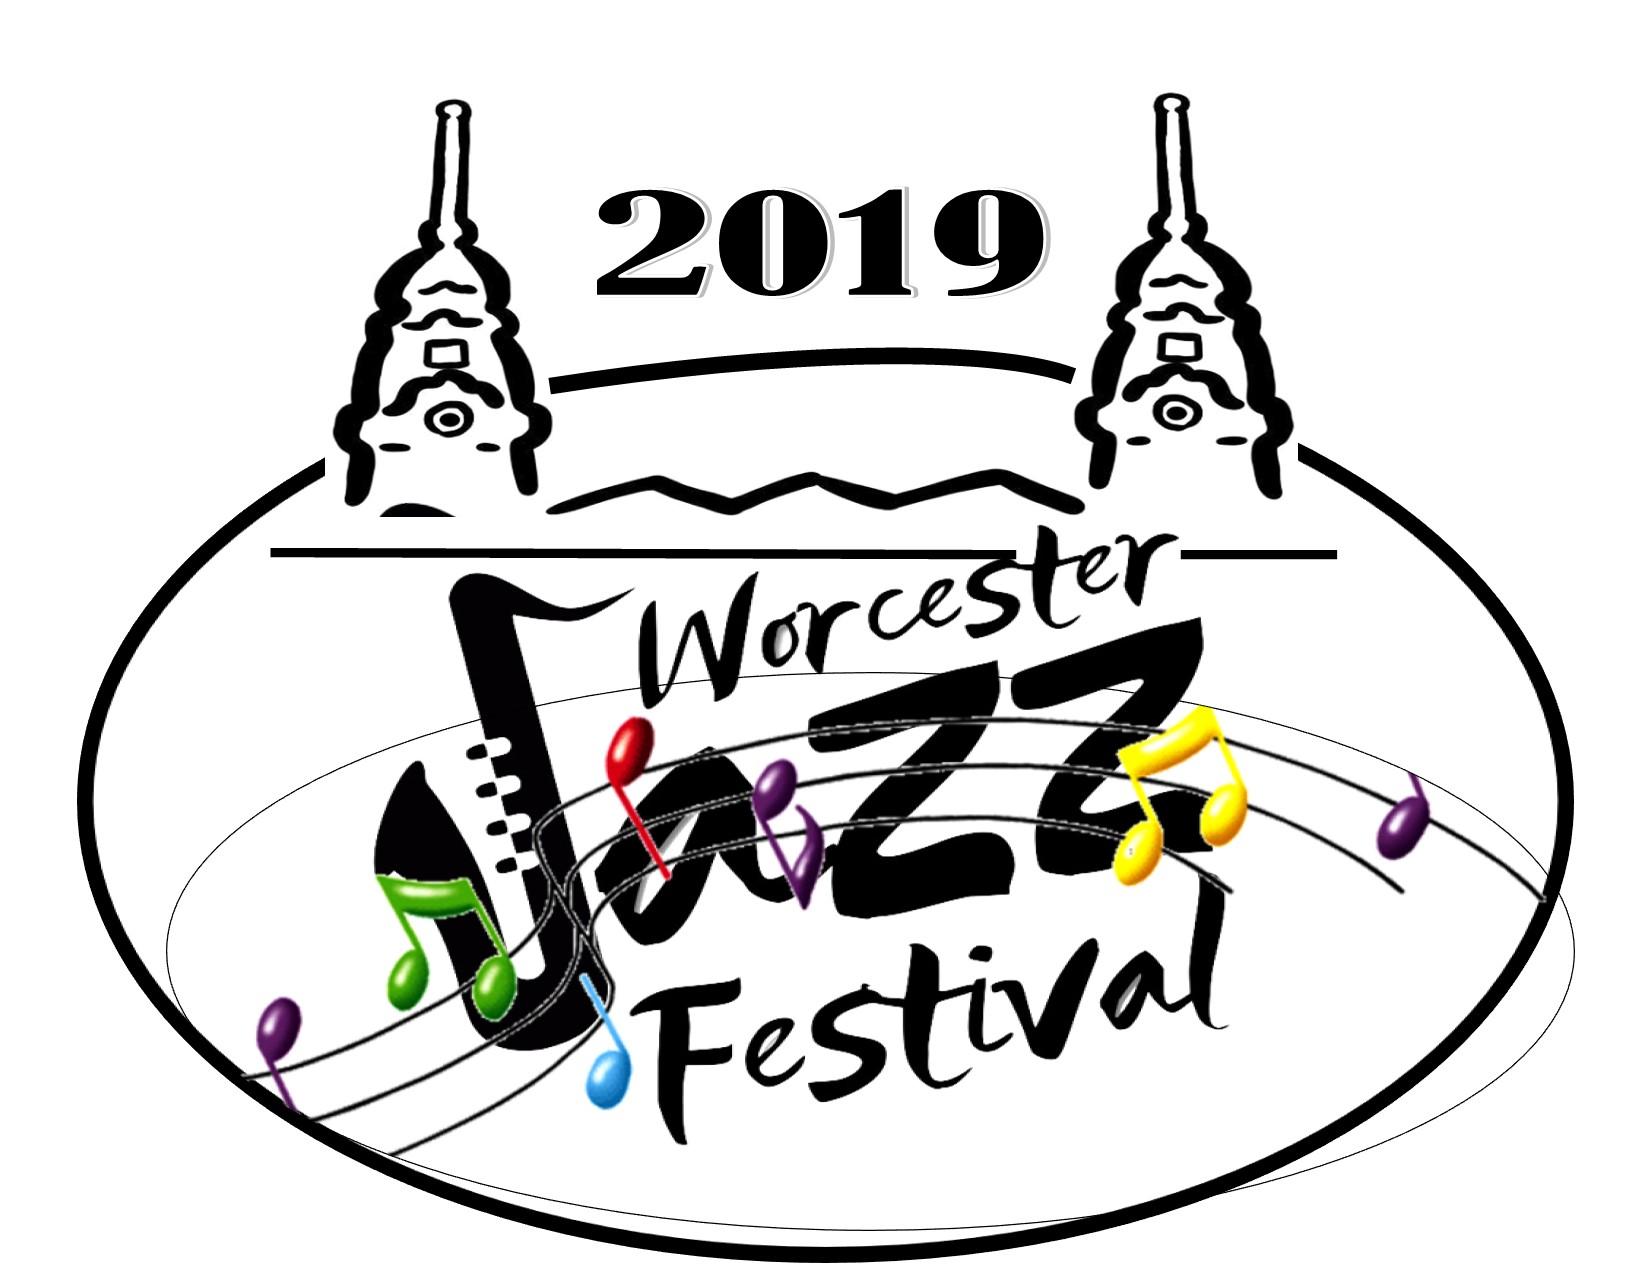 worcesterjazzfestival2019 logo